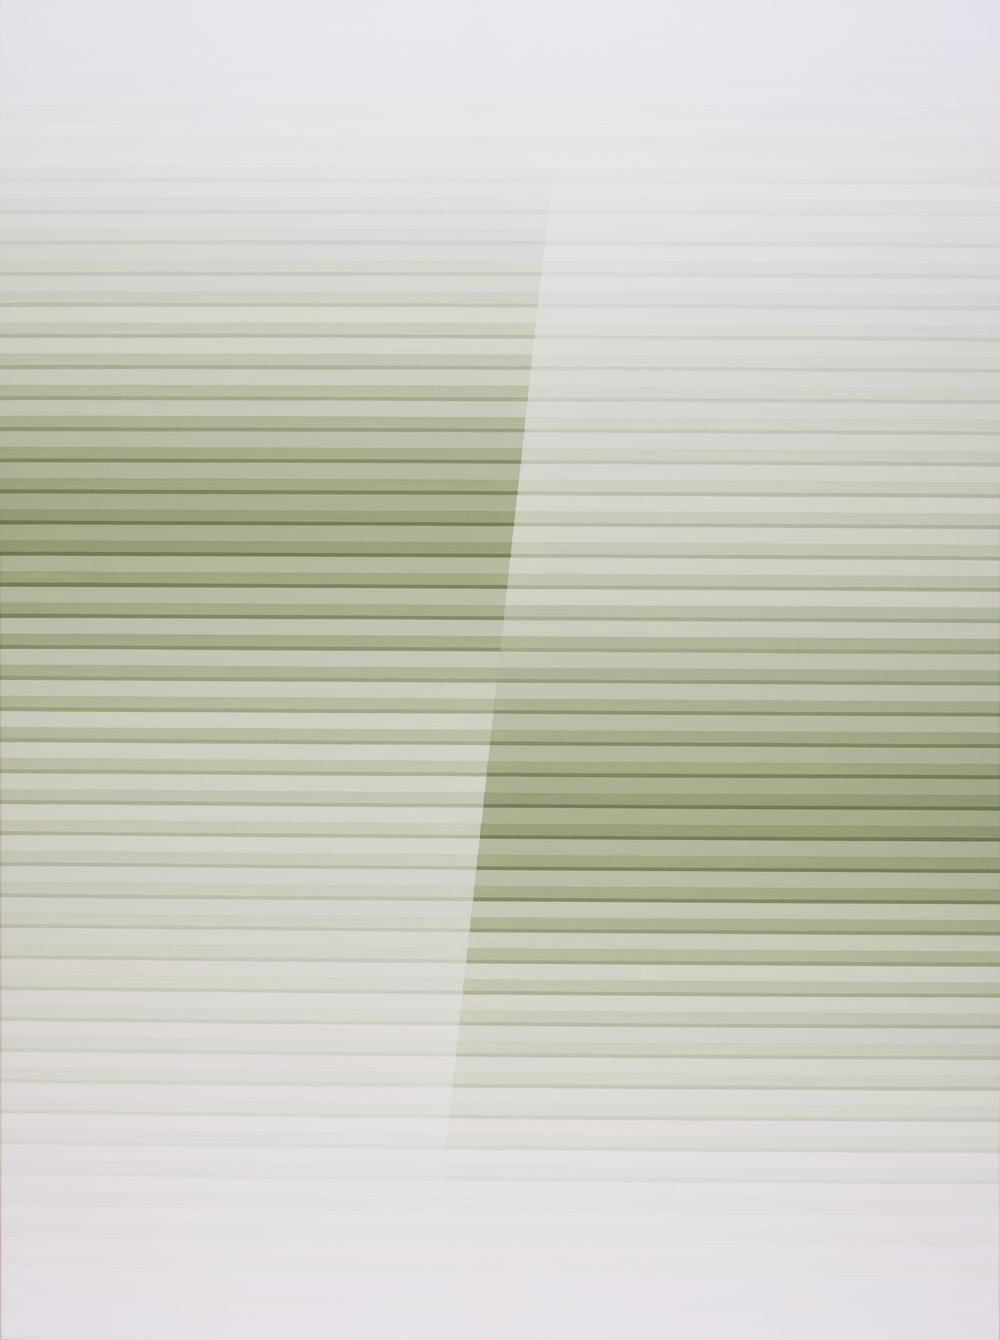 Miok Chung,  Transition 1623 ,97x130.3cm, acrylic on canvas, 2016